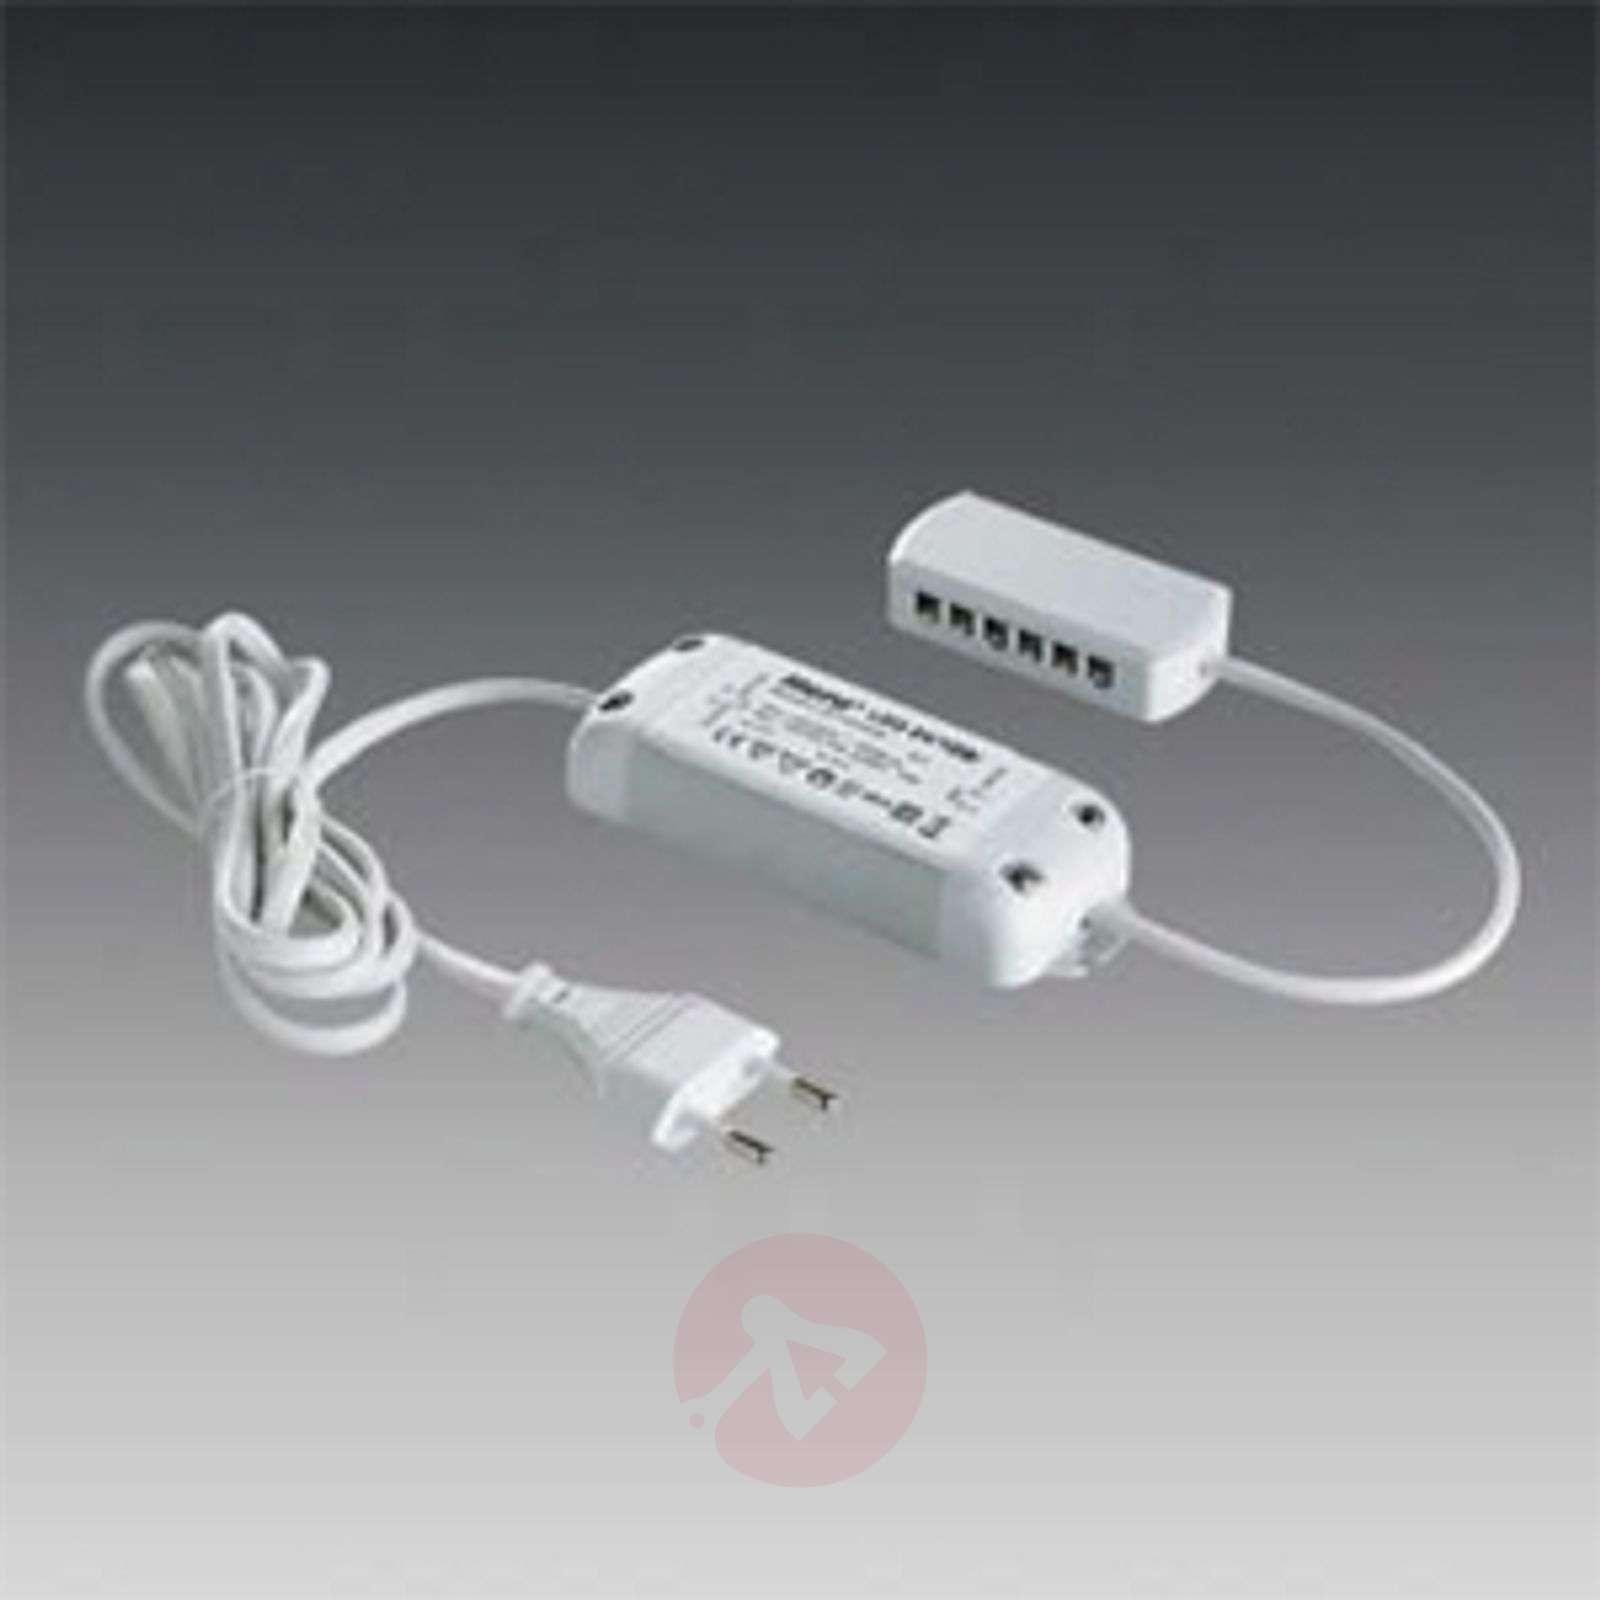 LED transformer 1-15W DC 24V, 12-way distributor-4514211-01